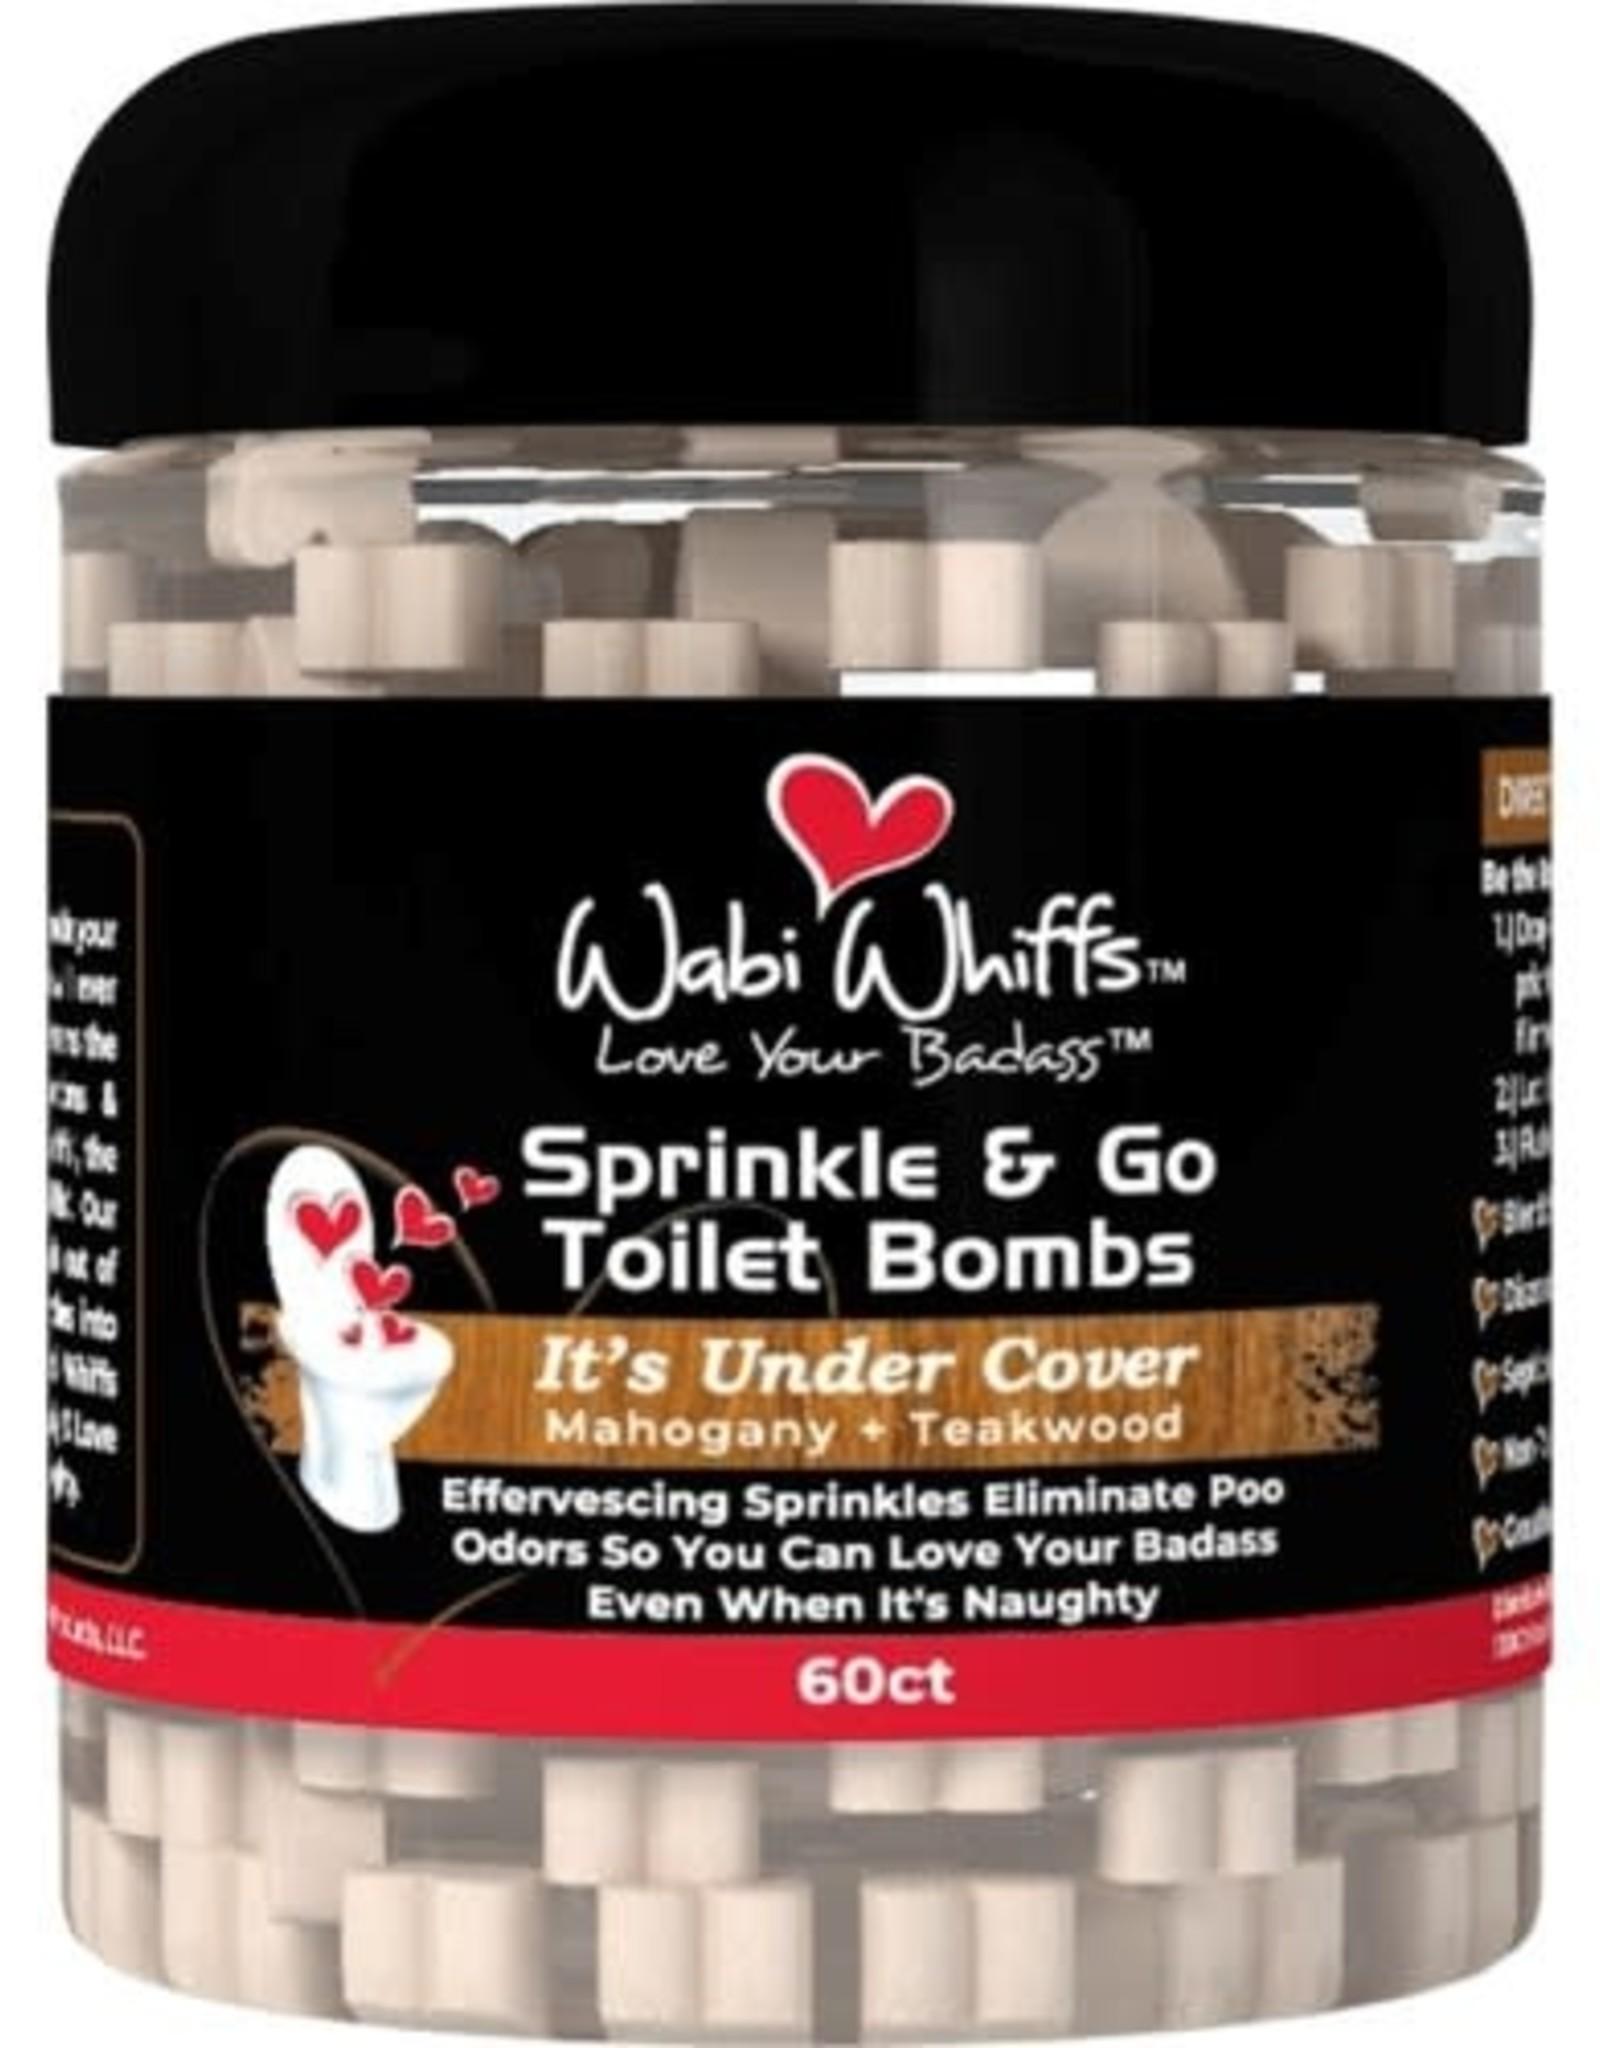 Wabi Wiffs Sprinkle & Go Toilet Bombs It's Under Cover